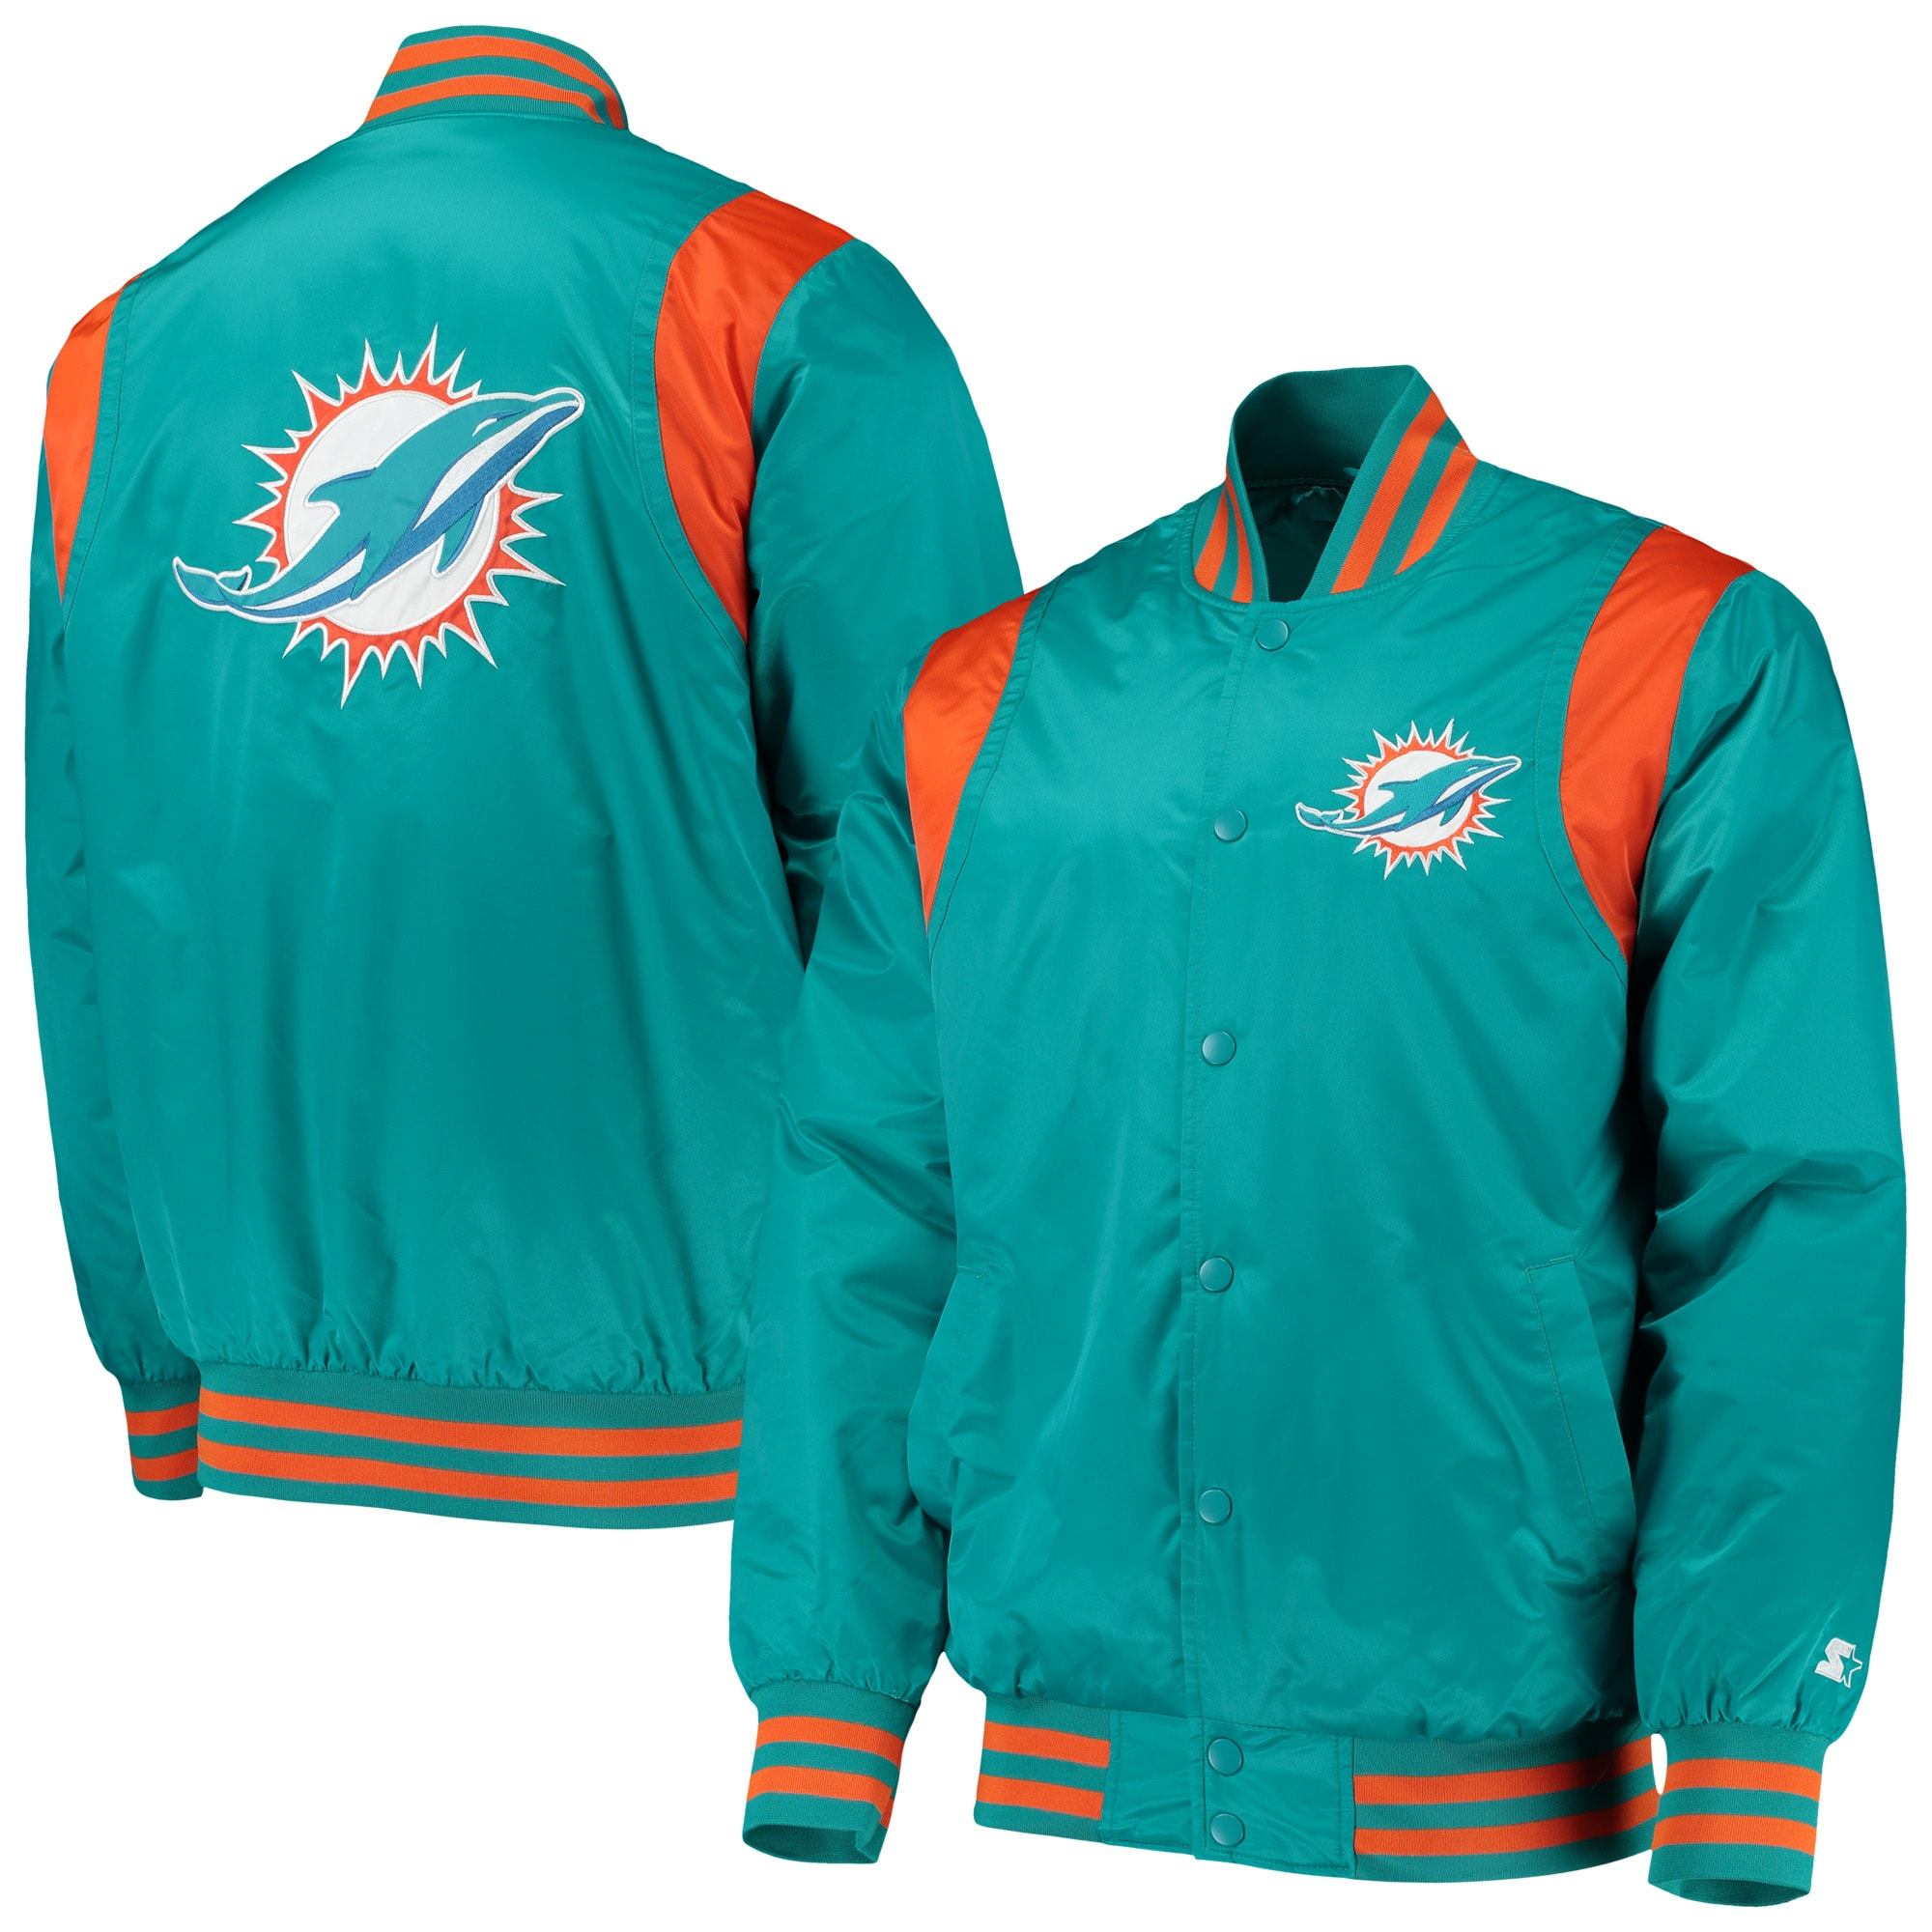 Miami Dolphins Starter Prime Time Twill Satin Varsity Full-Snap Jacket - Aqua/Orange